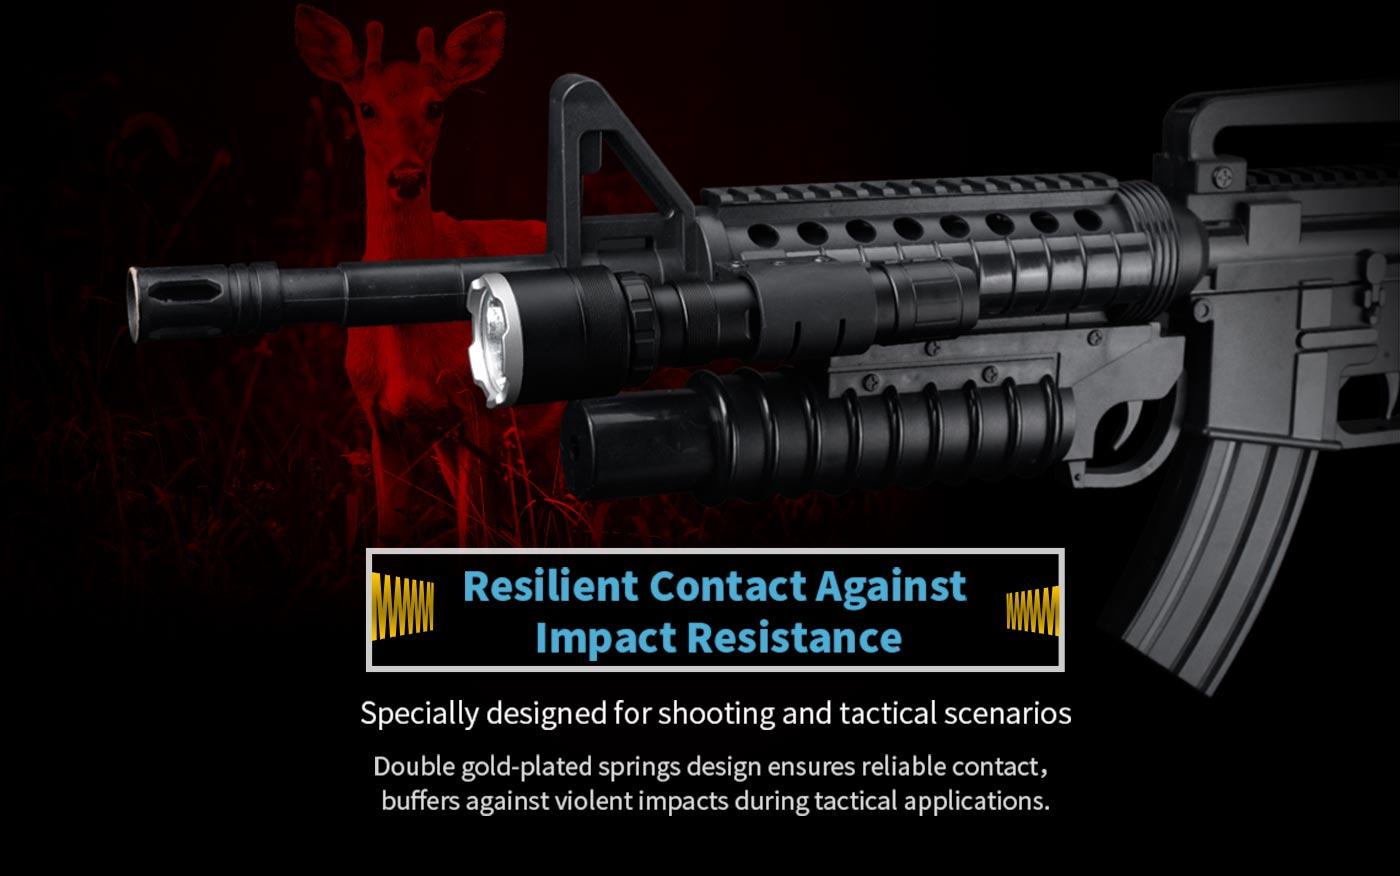 shockproof flashlight for gun, impact resistant flashlight, tactical hunting gear